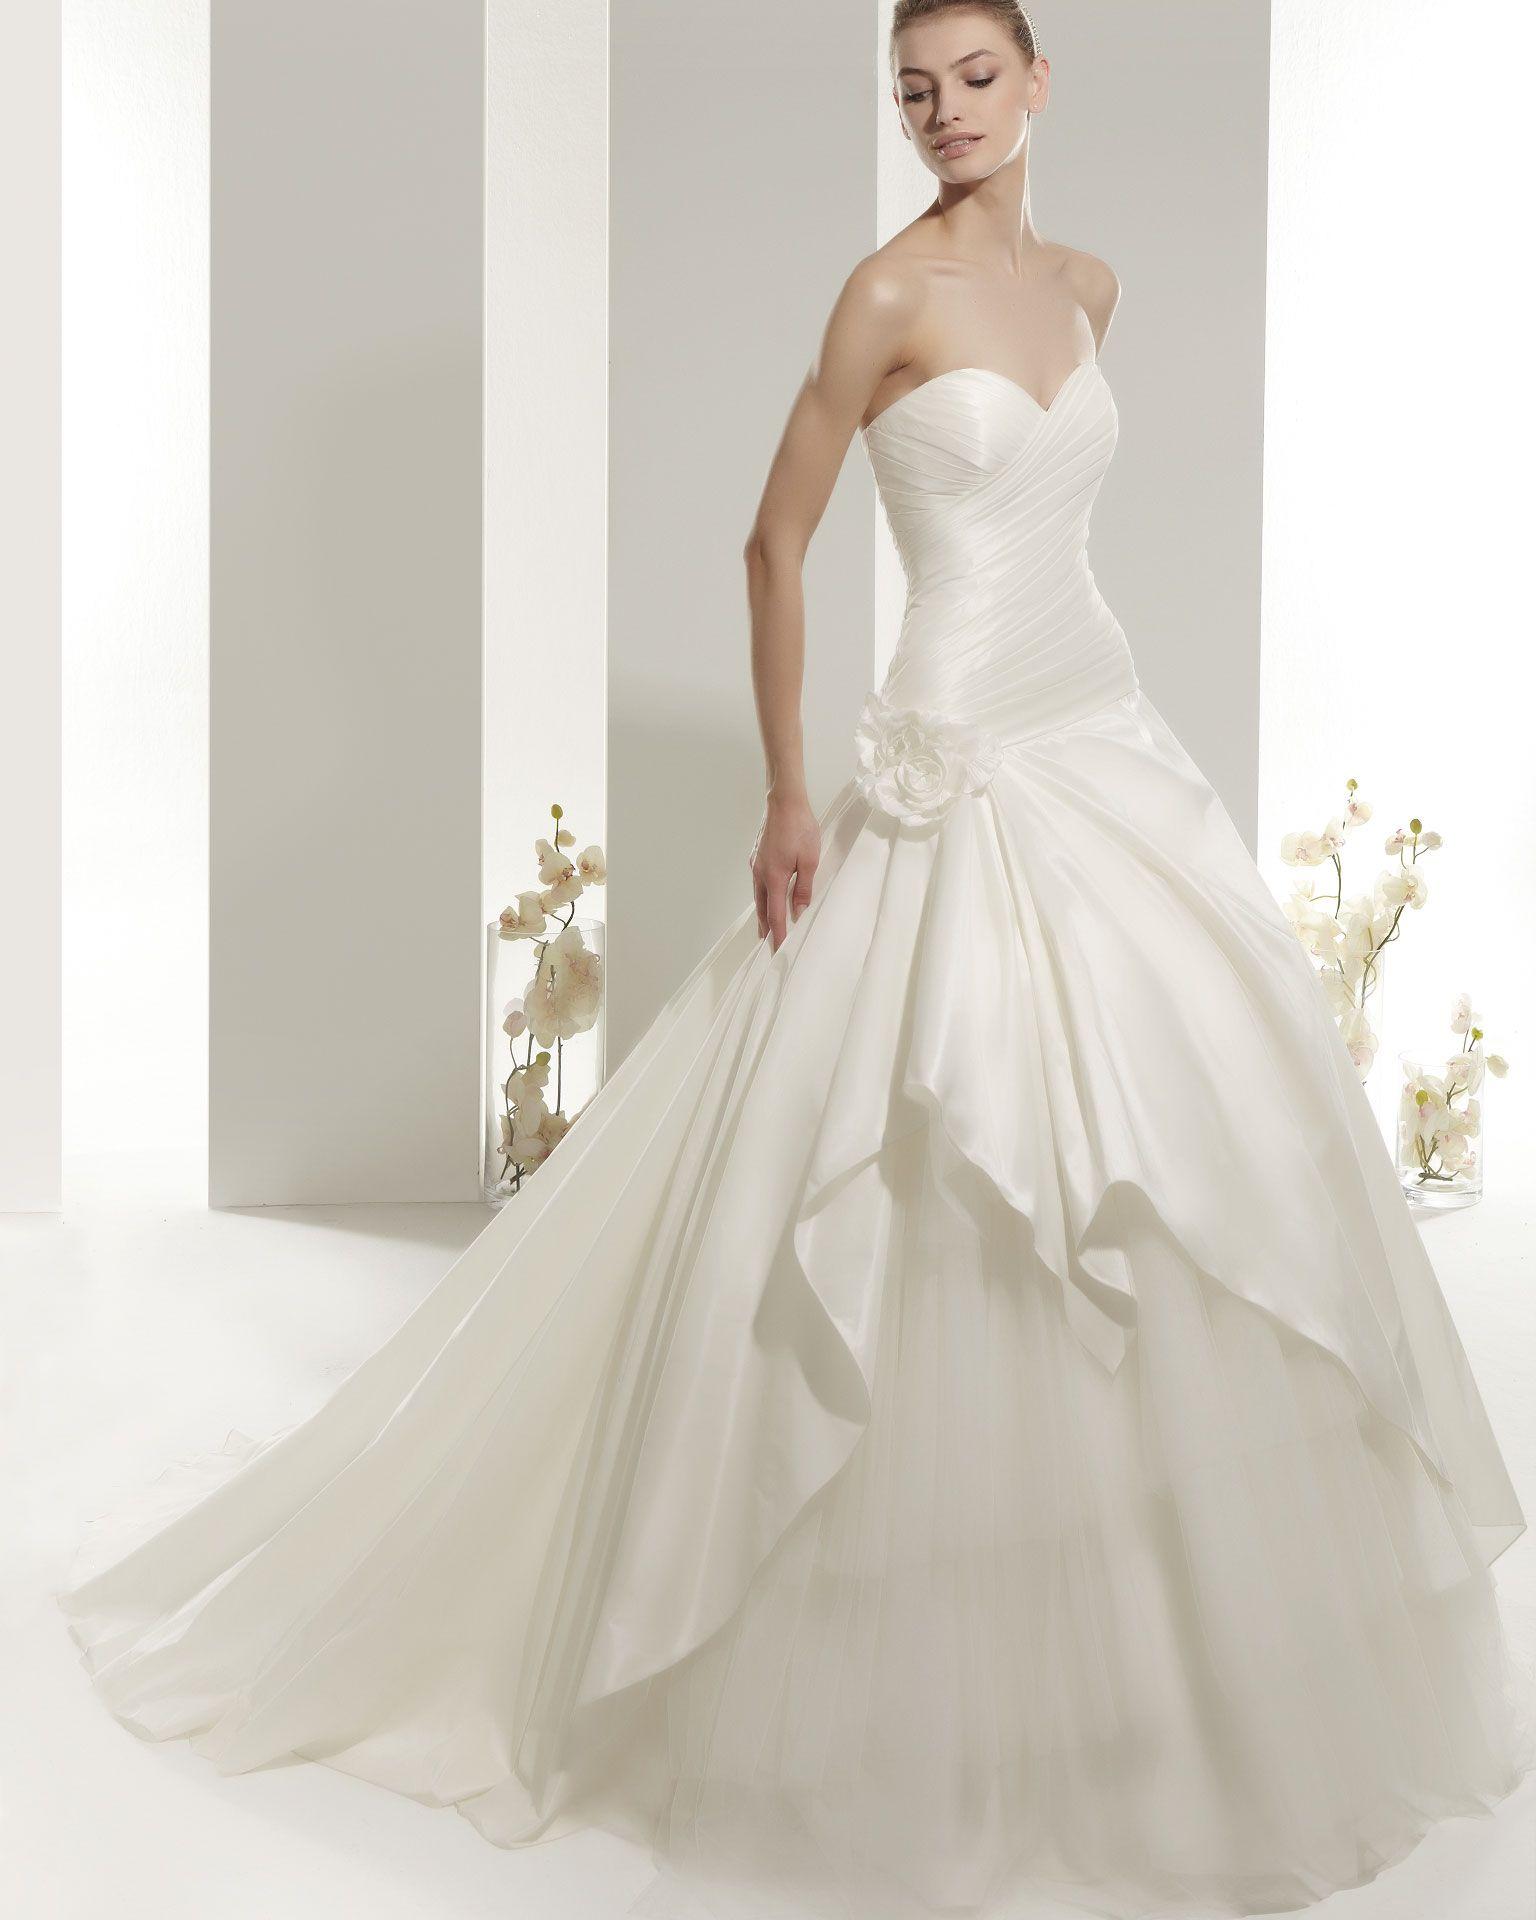 27 dresses wedding dress  فساتين زفاف عرايس زواج عروس  fisoraspot  فساتين